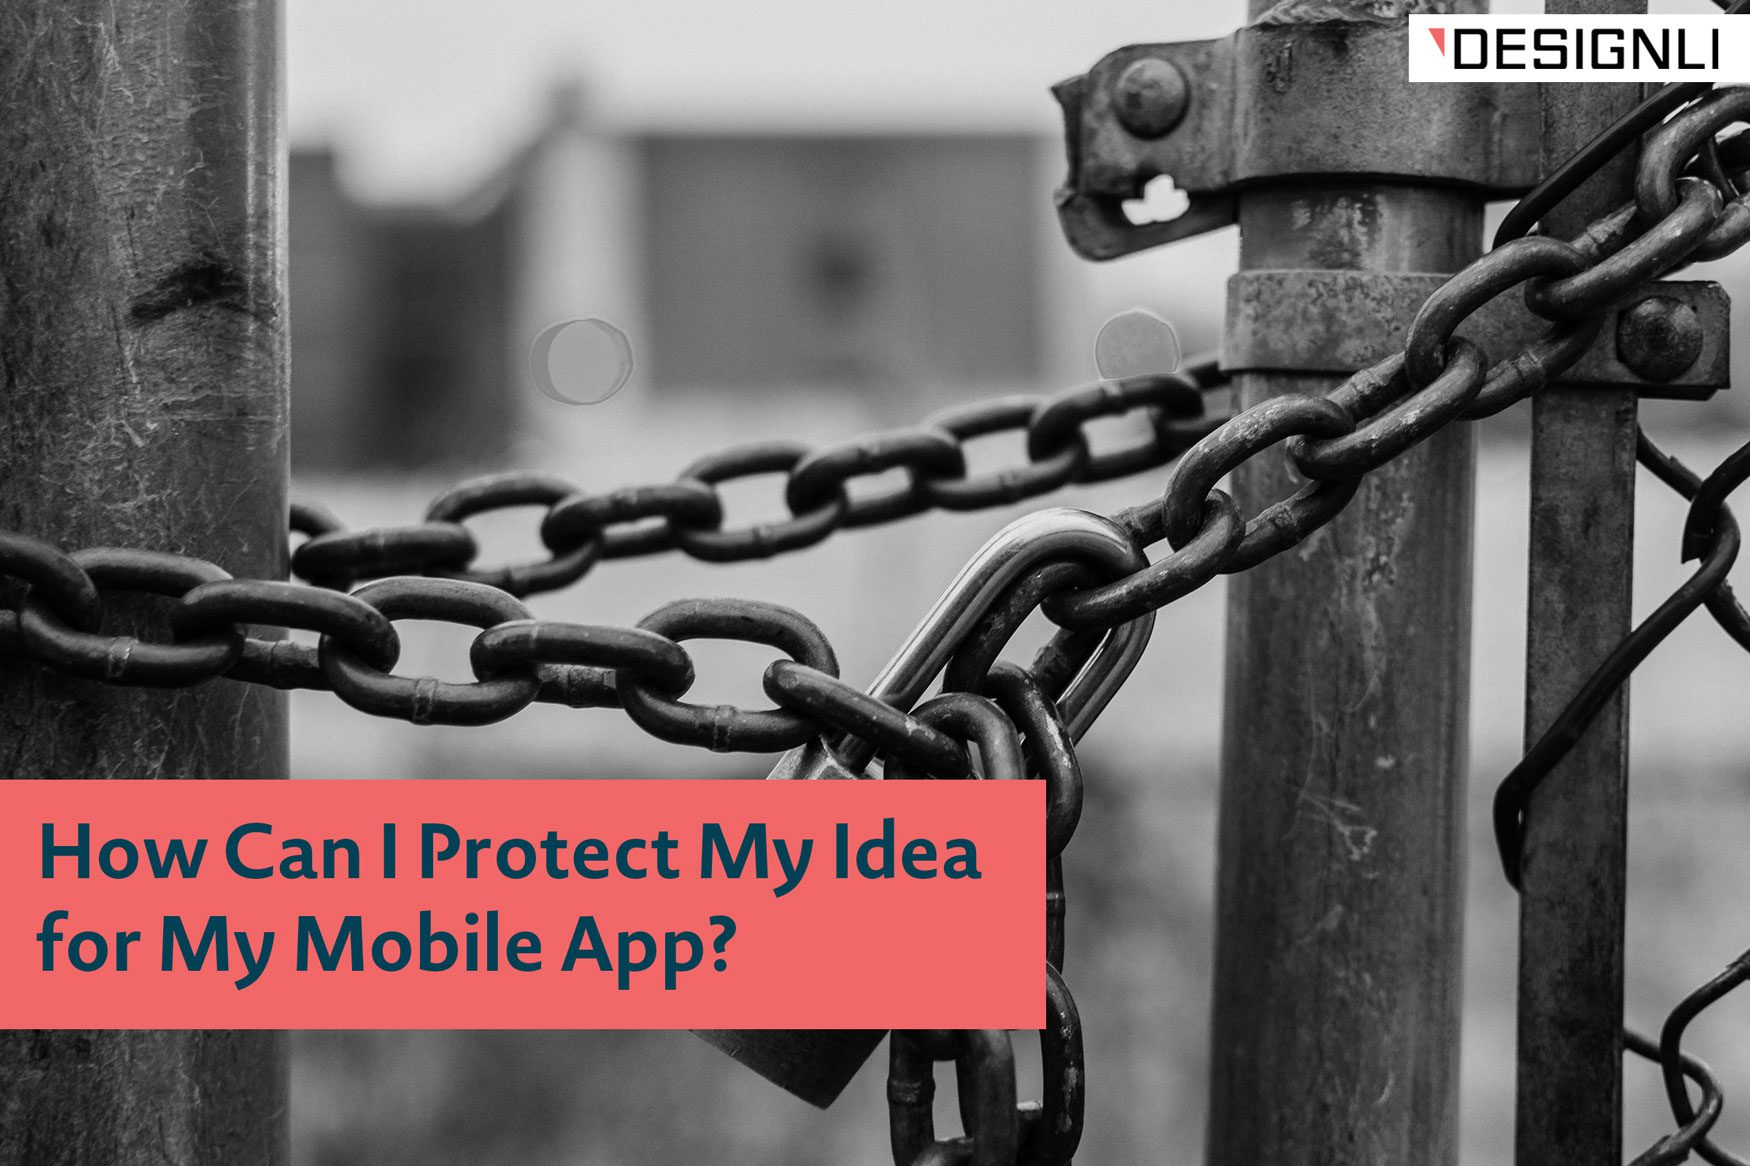 protect my app idea